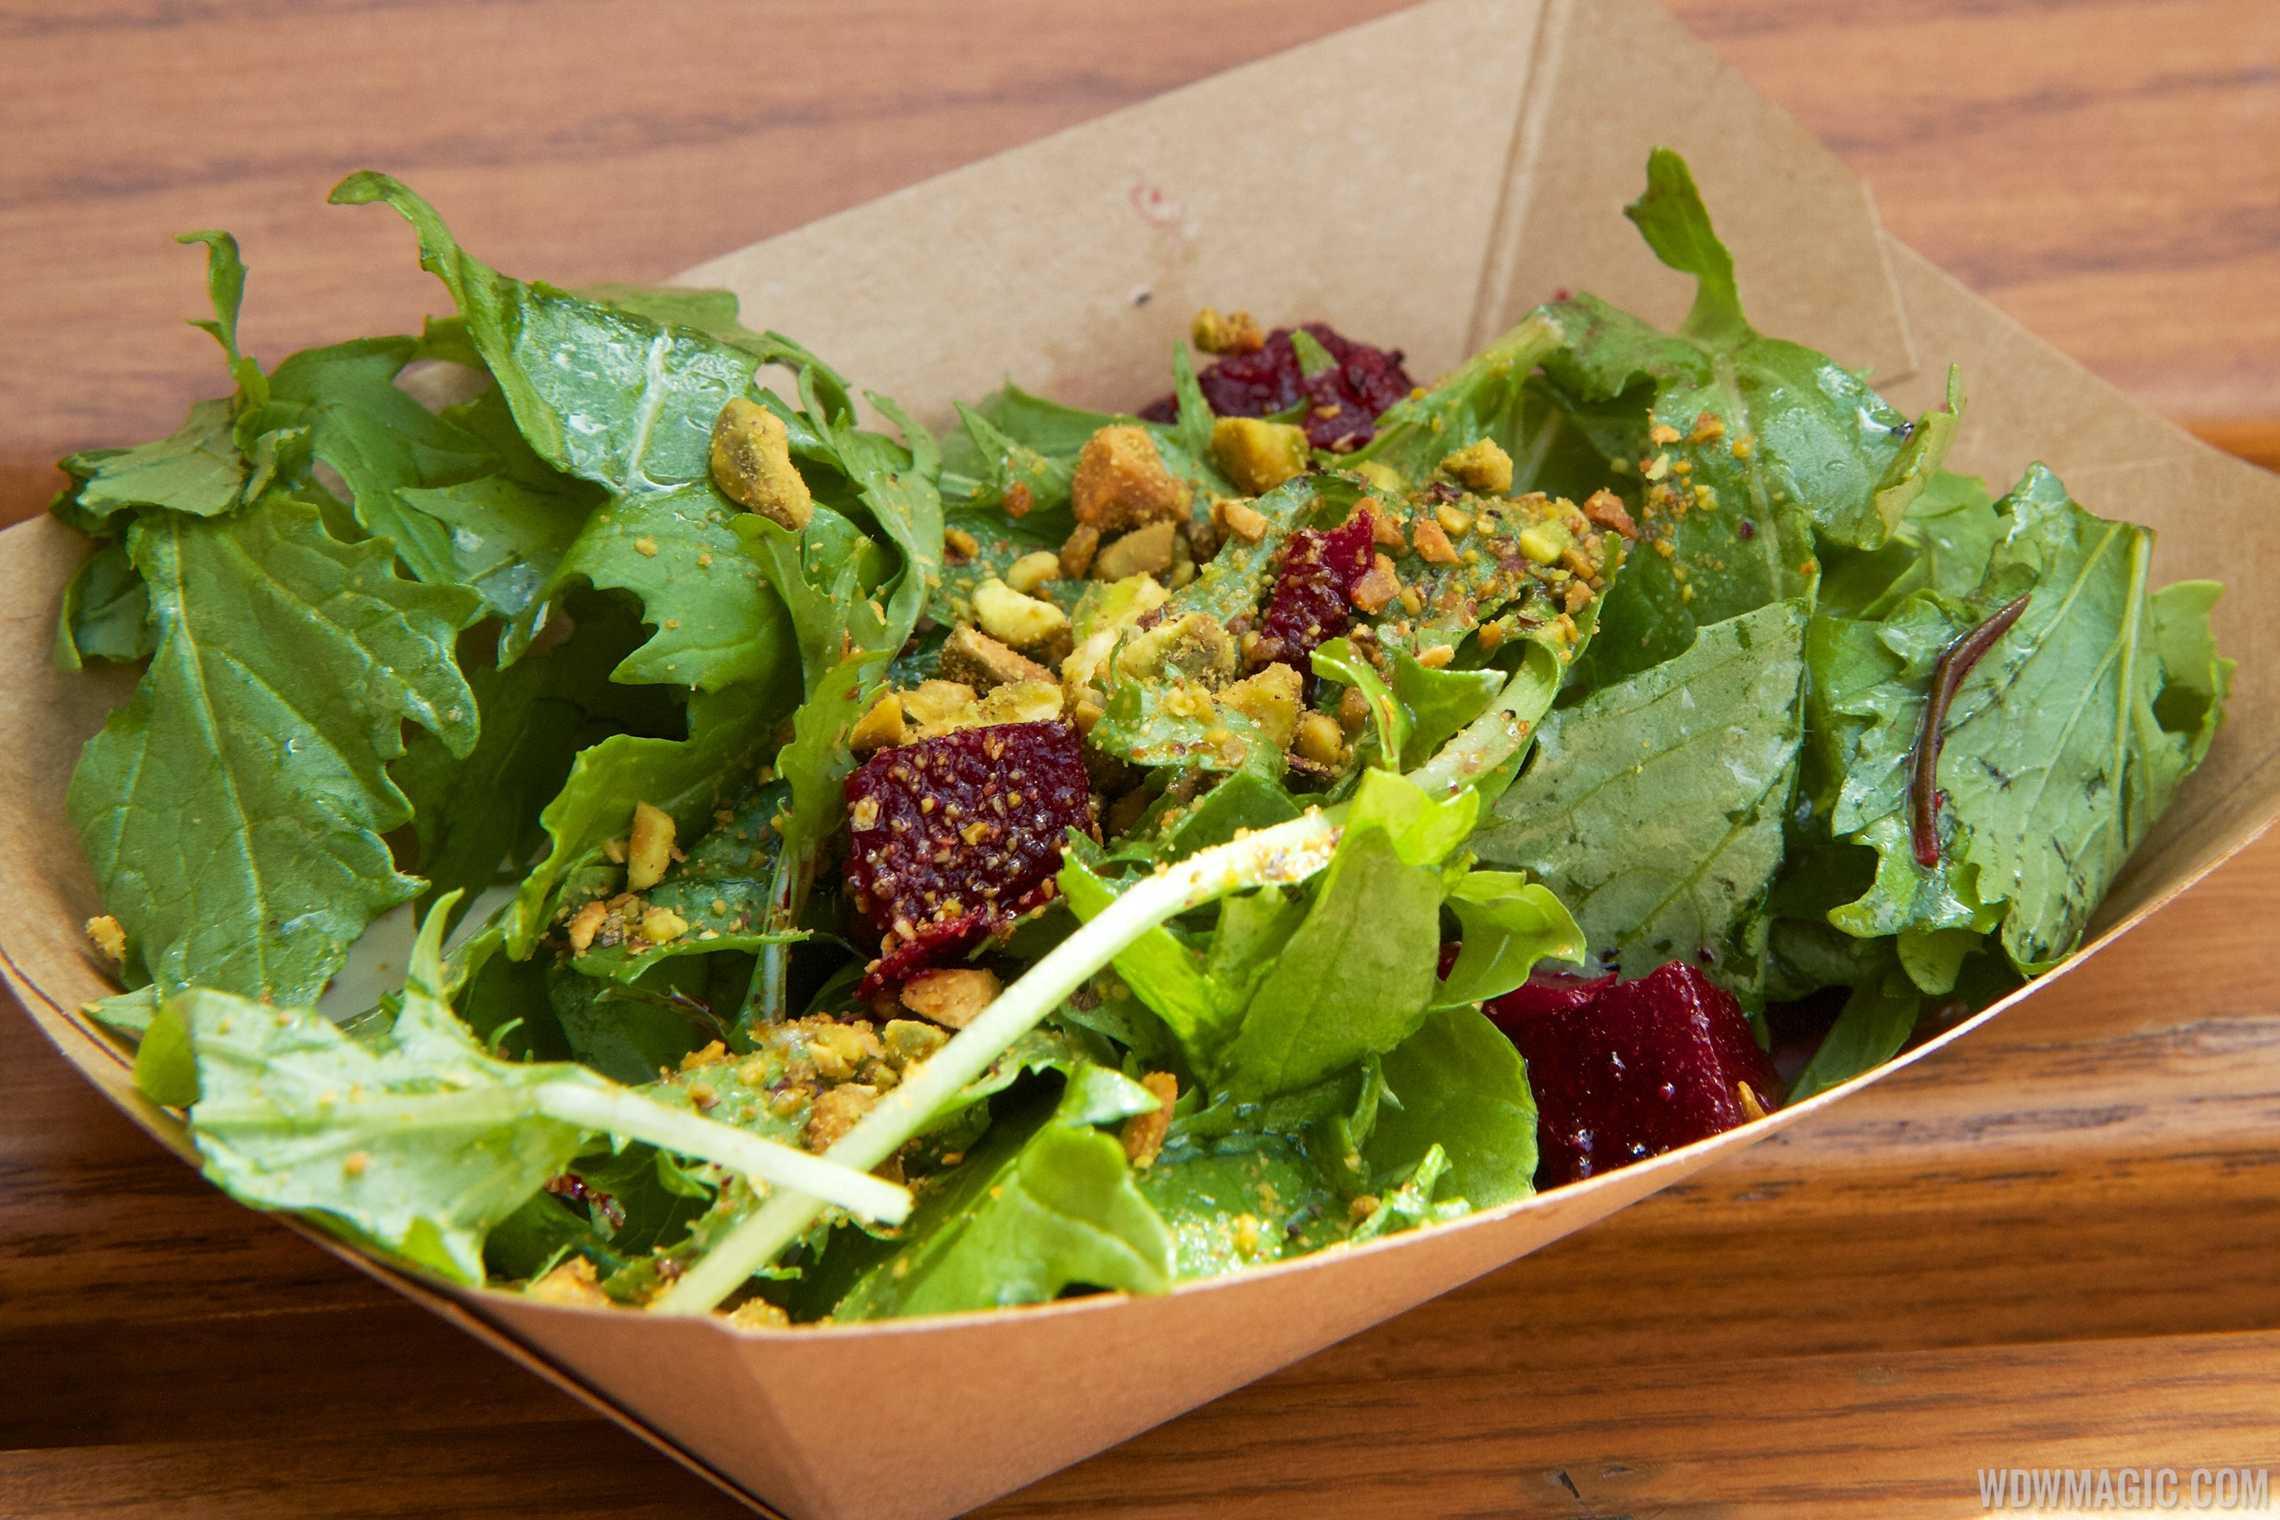 2014 Epcot Flower and Garden Festival Outdoor Kitchen - Urban Farm Eats - Pickled beet salad